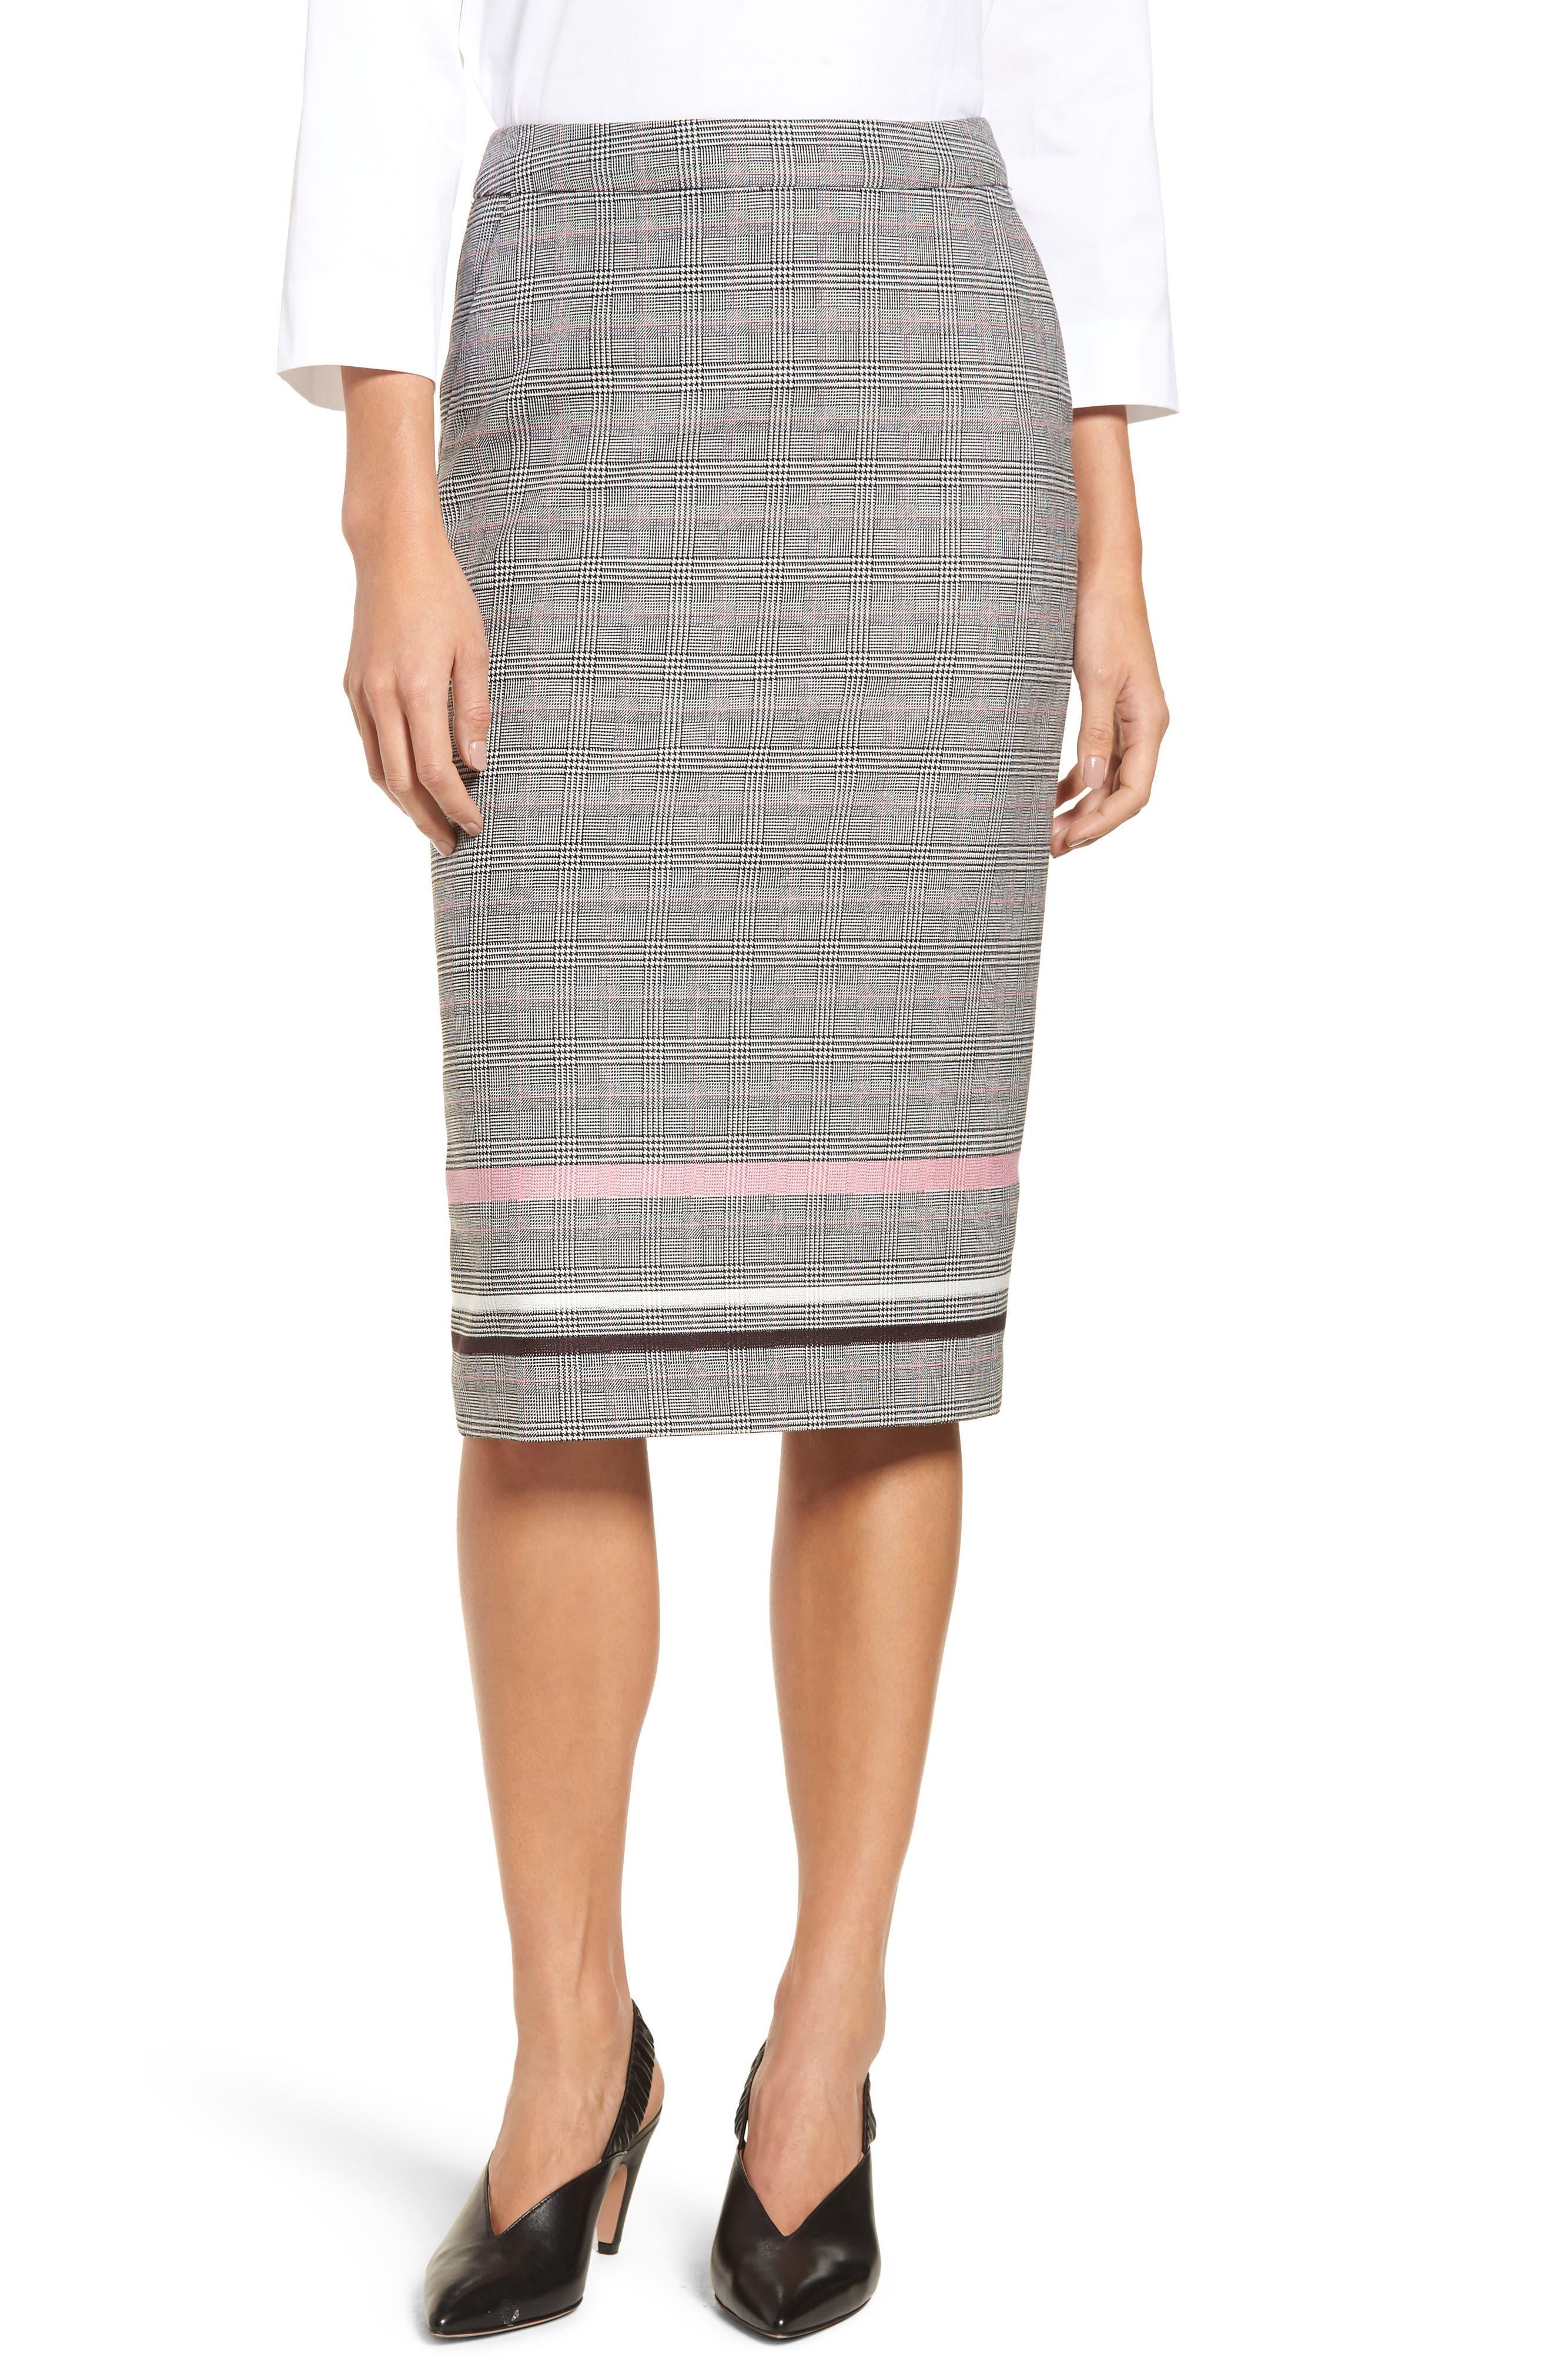 Petite Plaid Stripe Pencil Skirt HALOGEN® $44.49 (Nordstrom)